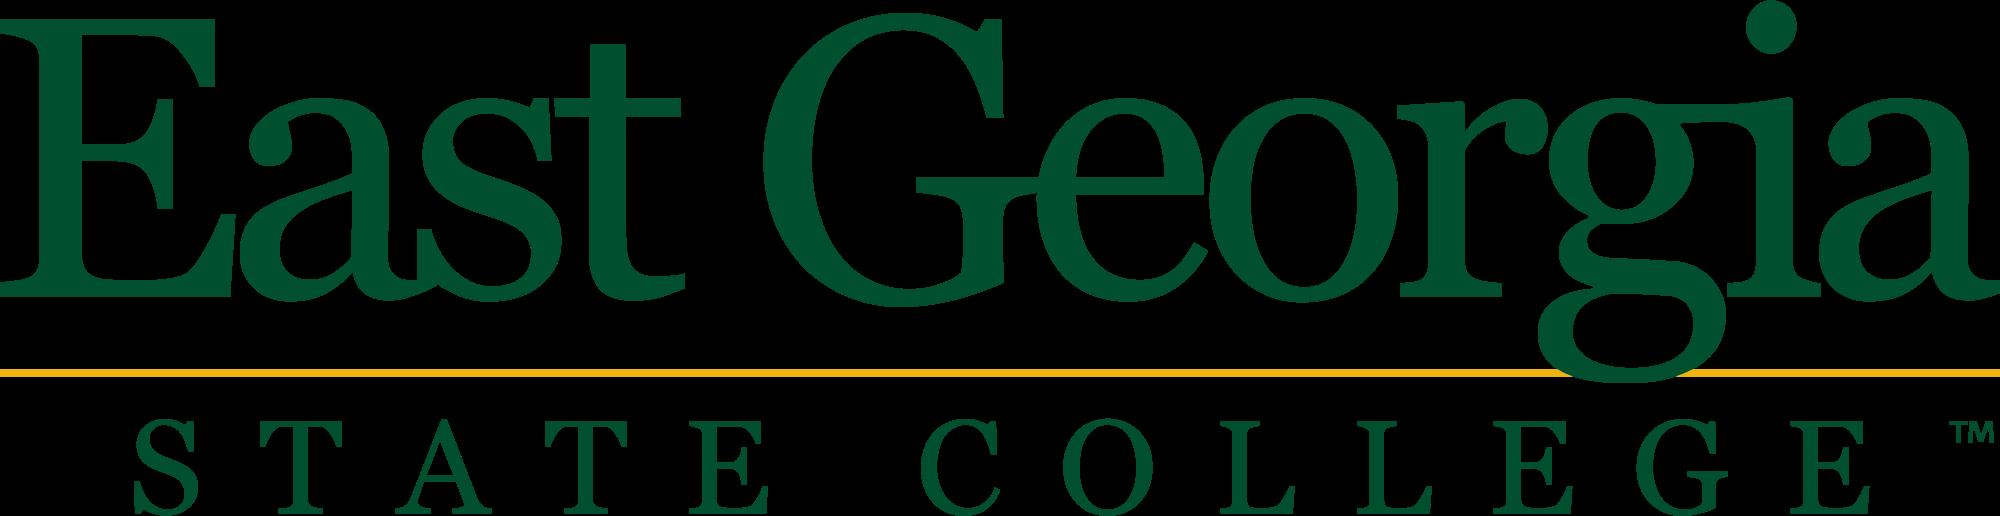 East Georgia College logo